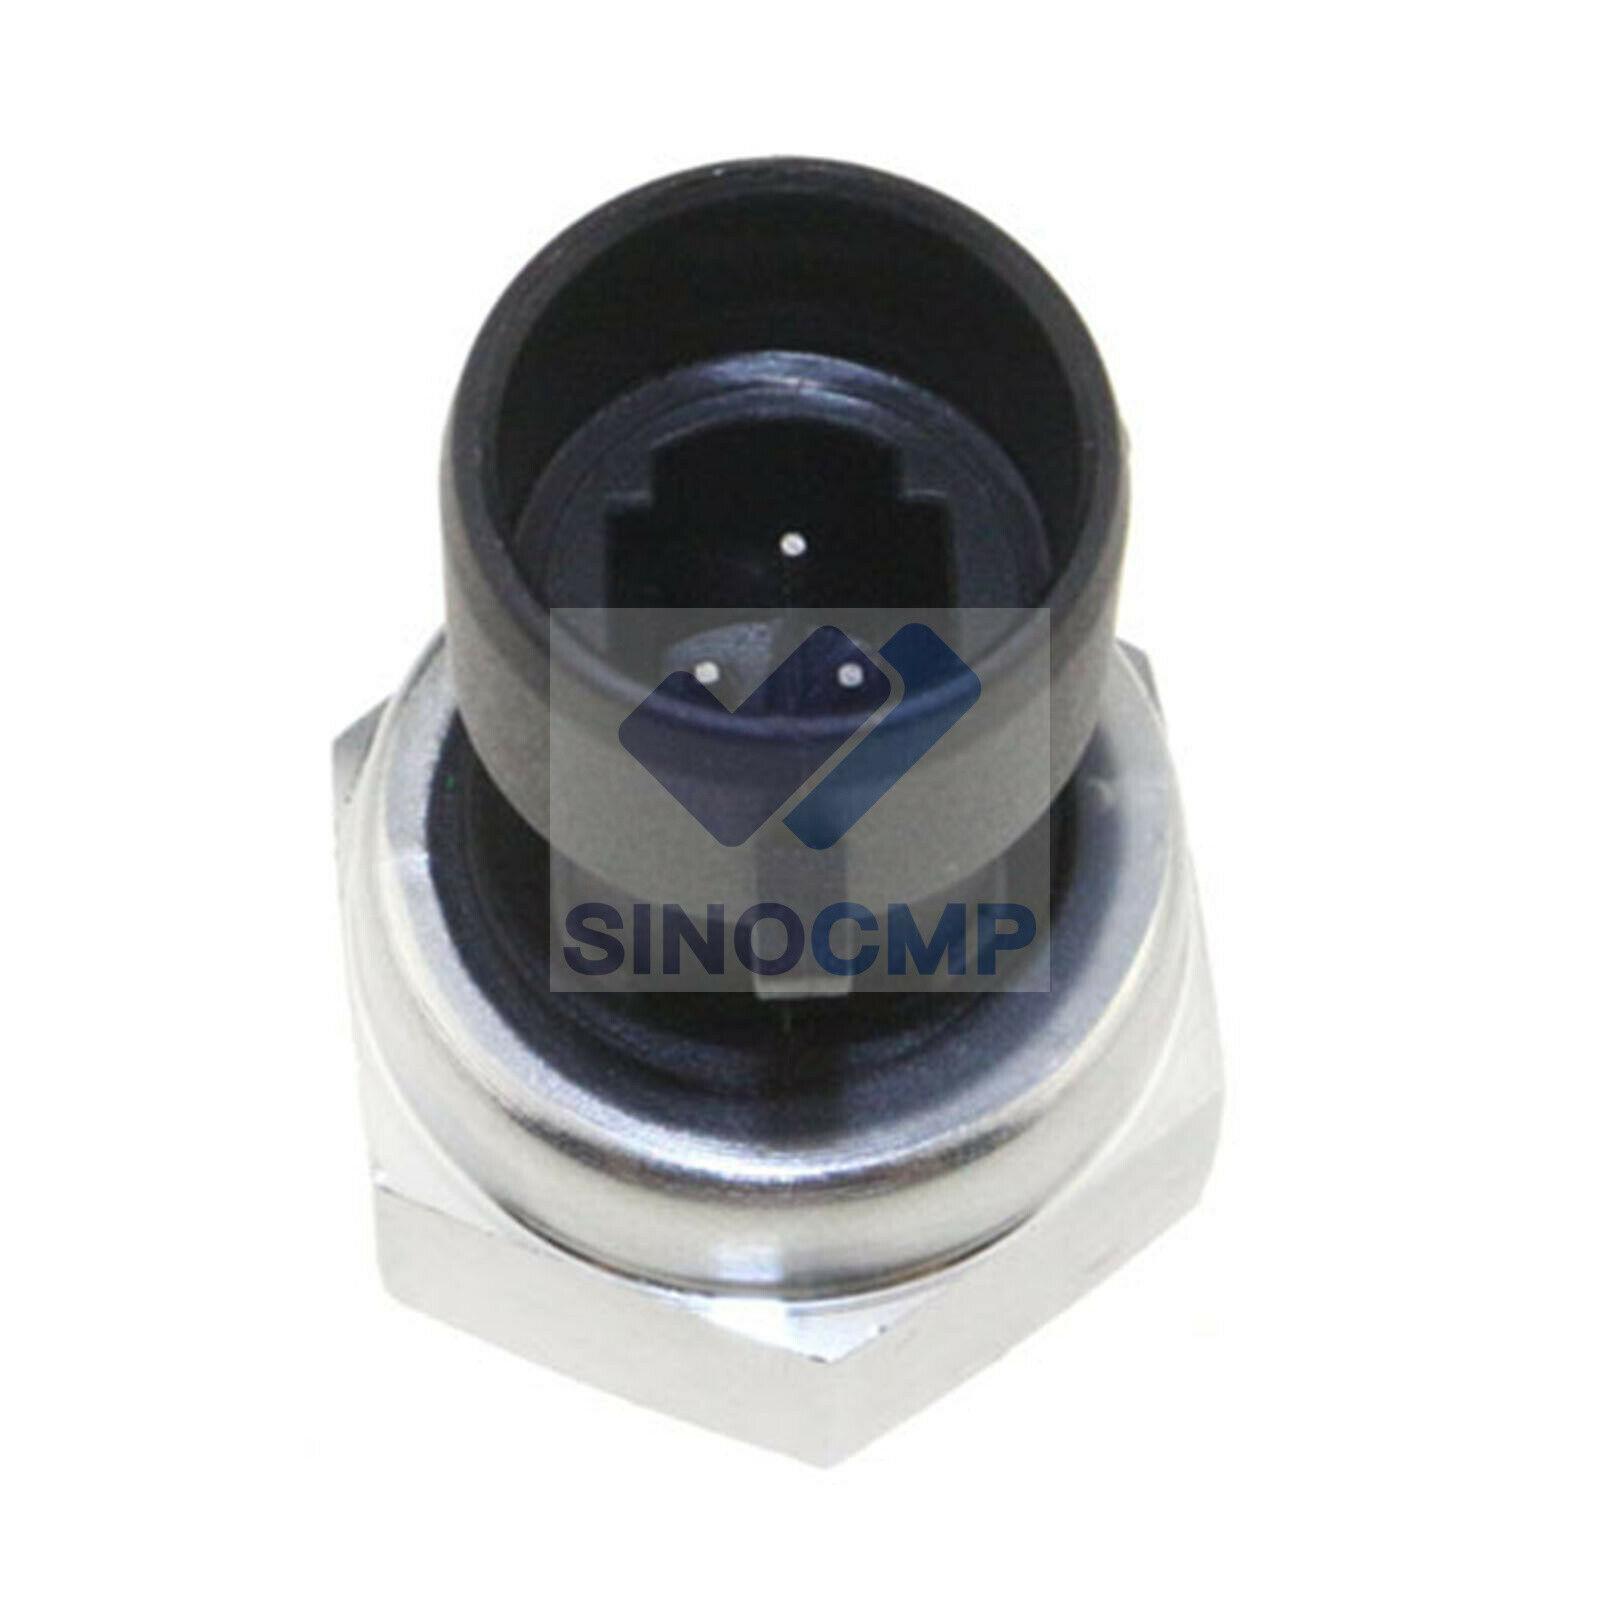 5V G1/4 0-1.2 MPa/ 0-150PSI Pressure Transmitter Water Gas Oil Pressure Sensor